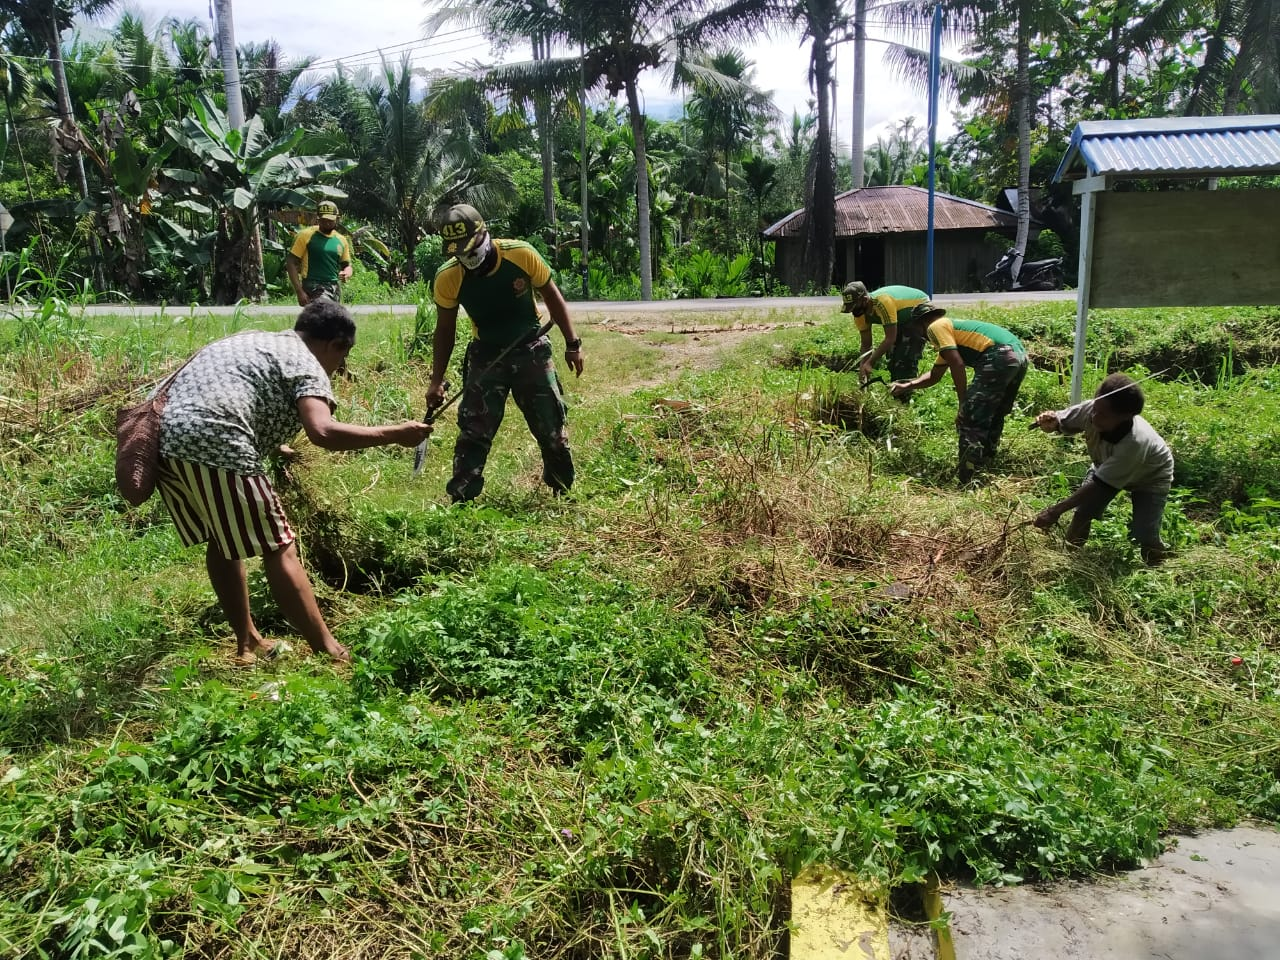 Satgas Yonif MR 413 Kostrad Peduli Kebersihan di SD Inpres Yowong